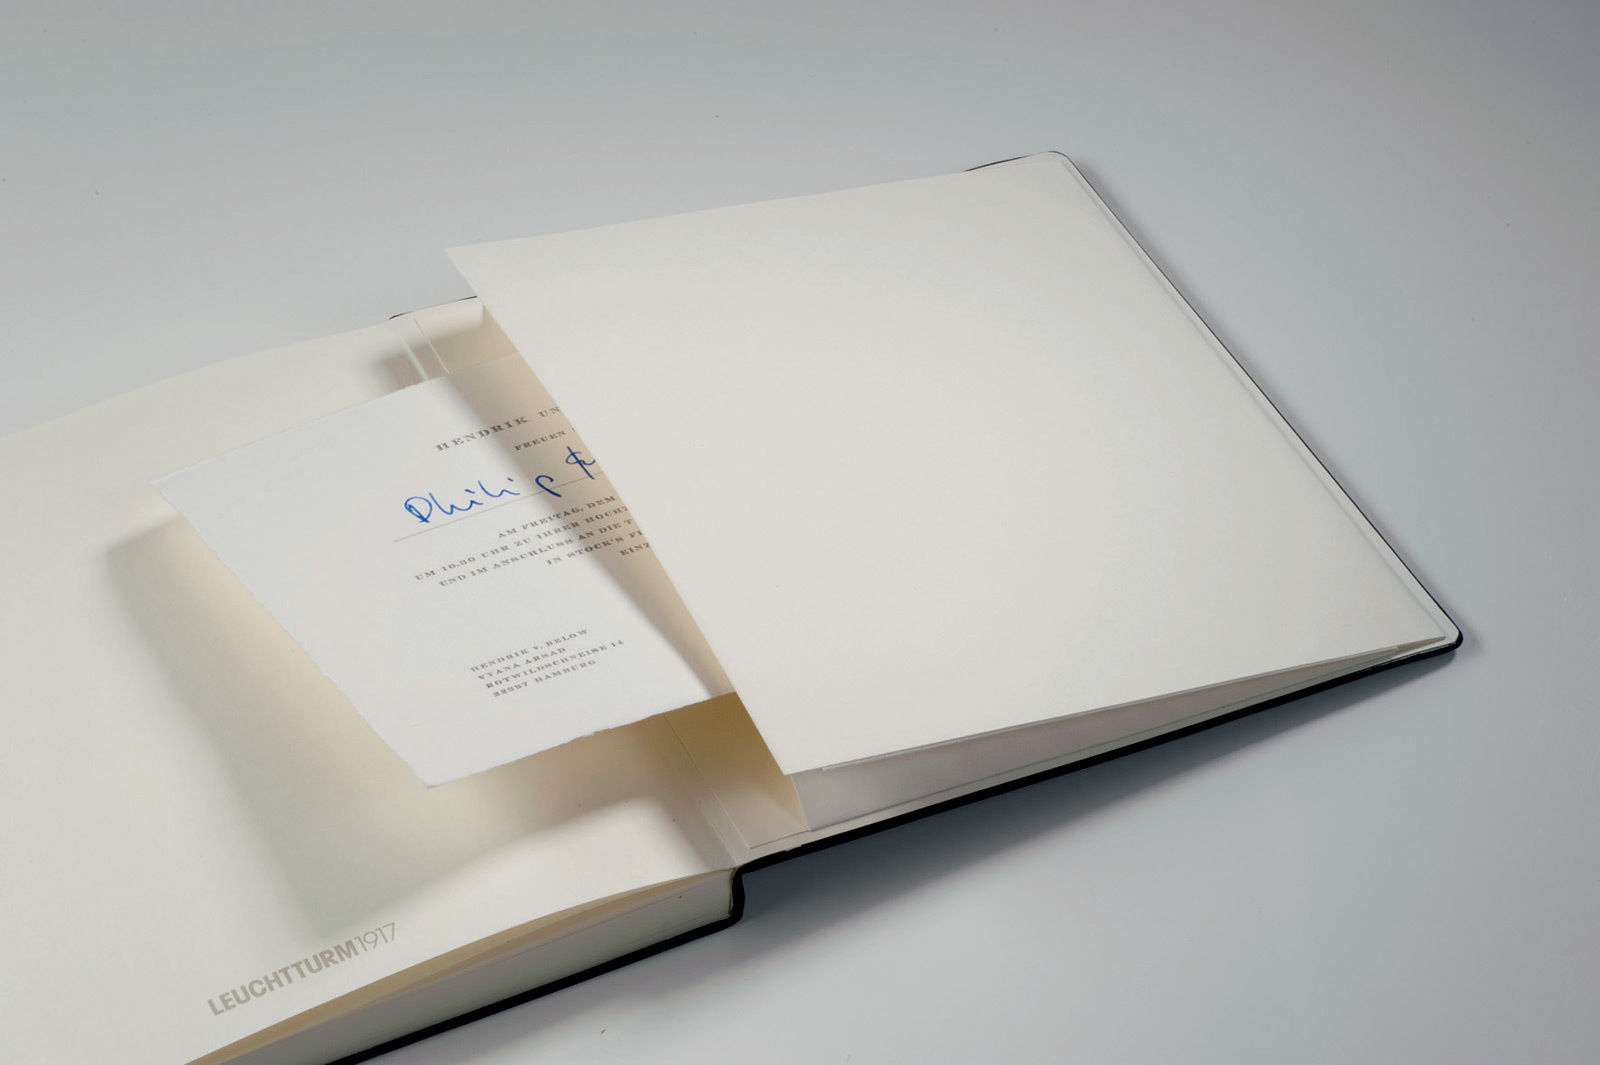 Leuchtturm1917-100Years-Metallic-Edition-A6-Hardback-Notebook-Gold-Silver-Copper-152488682213-6